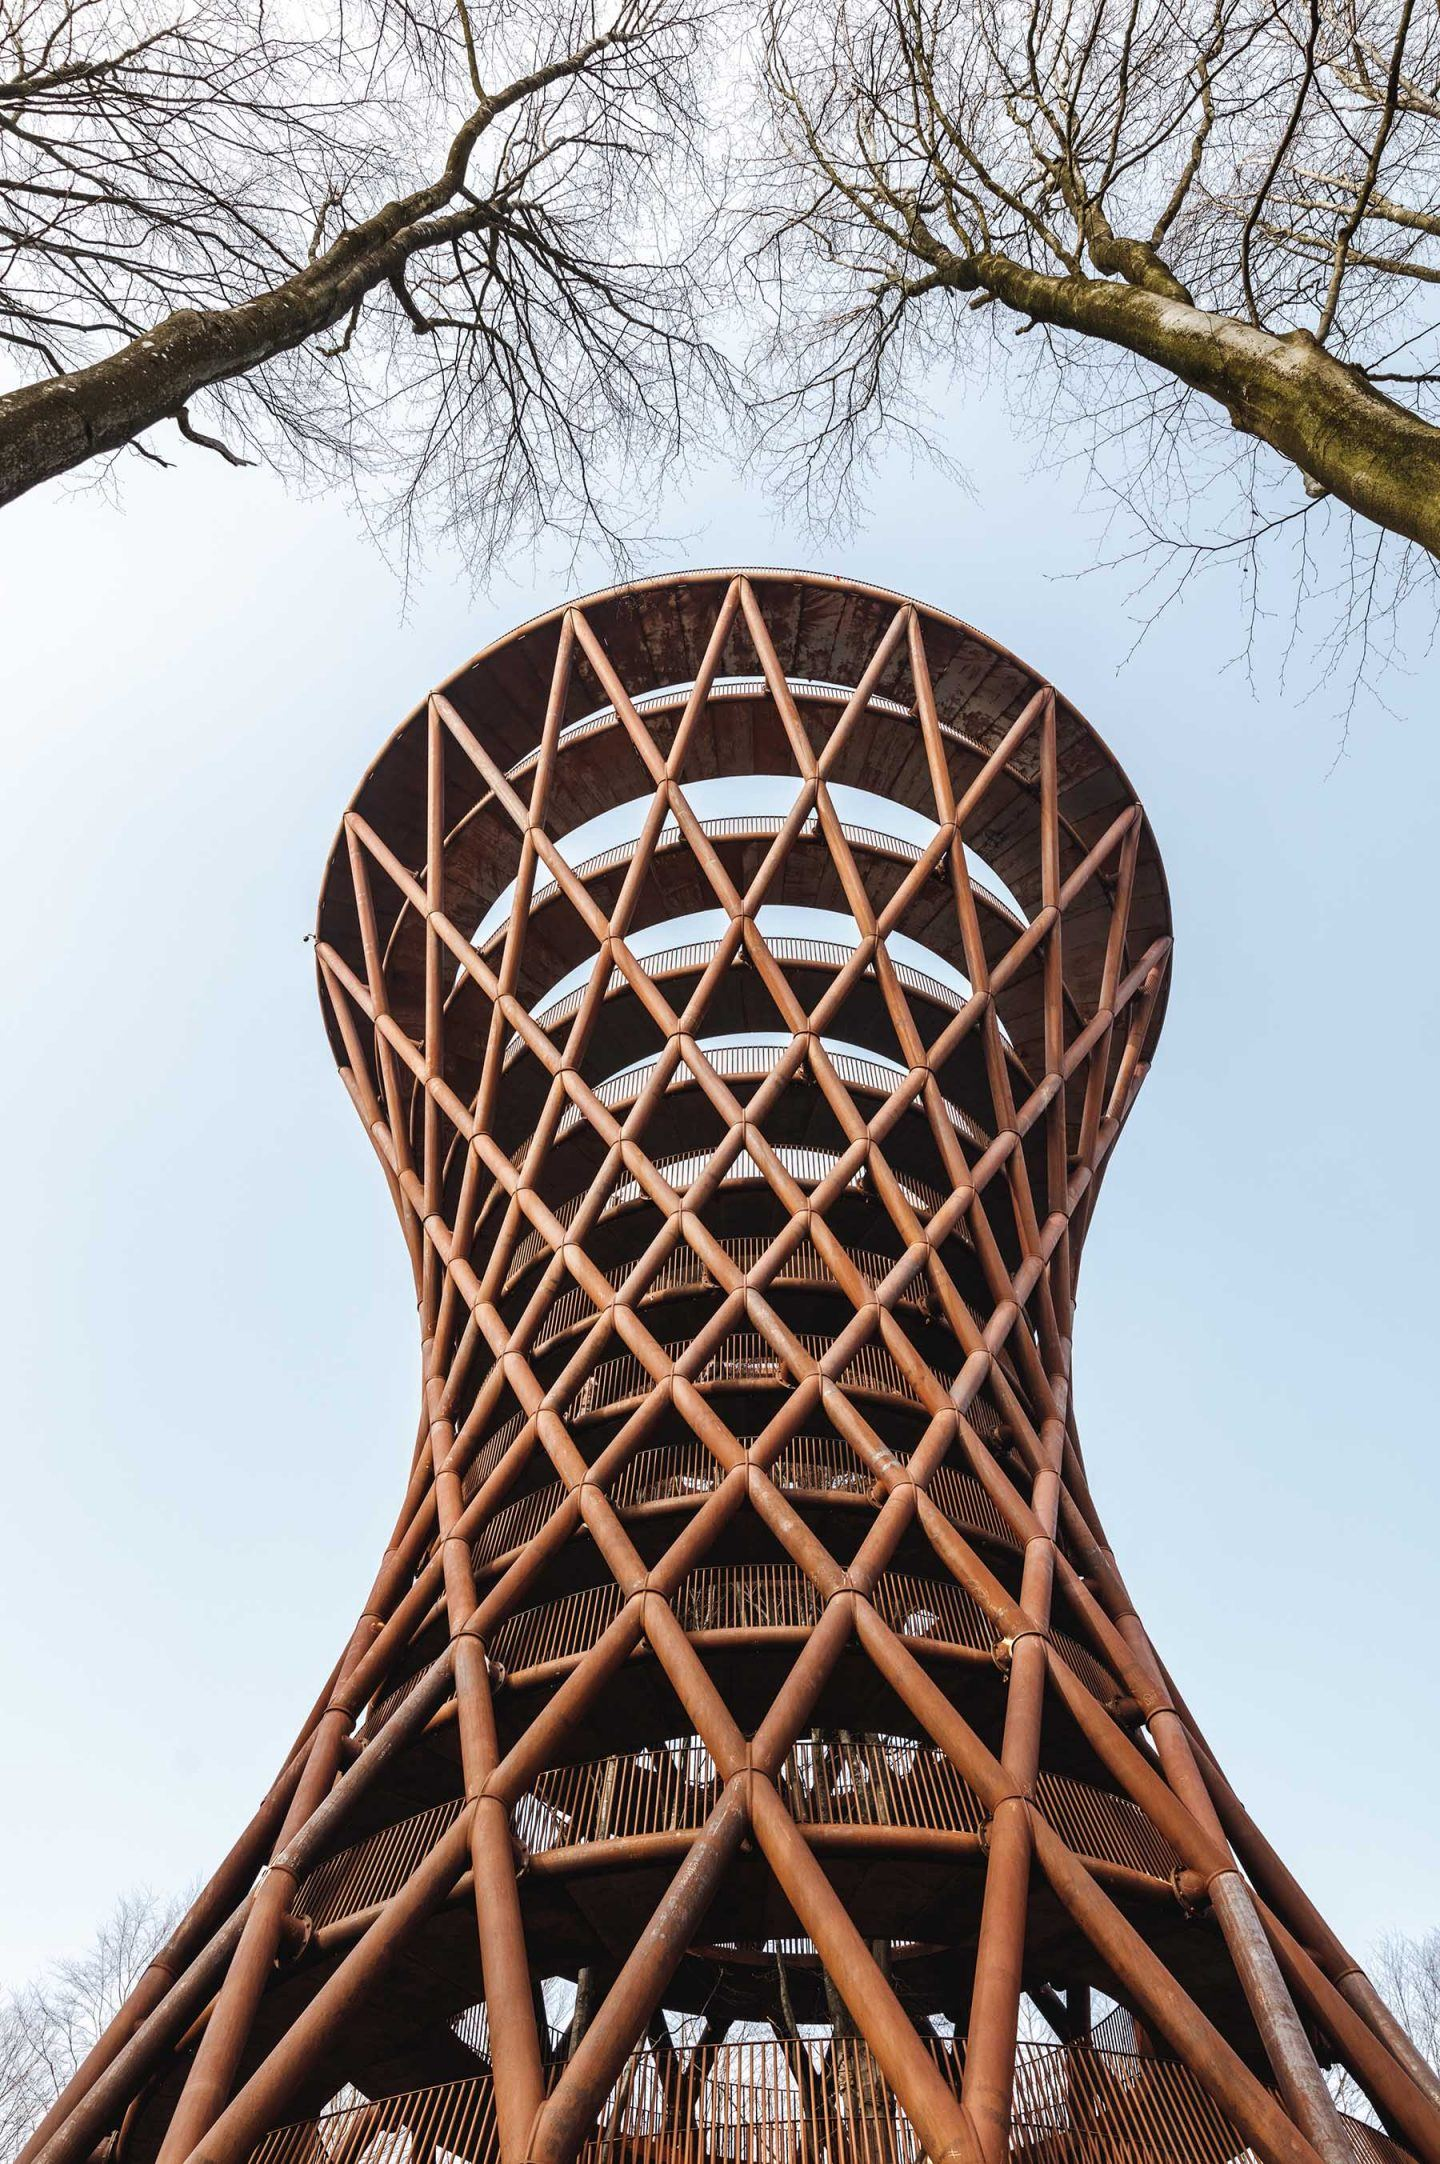 IGNANT-Architecture-Effekt-Camp-Adventure-Tower-27